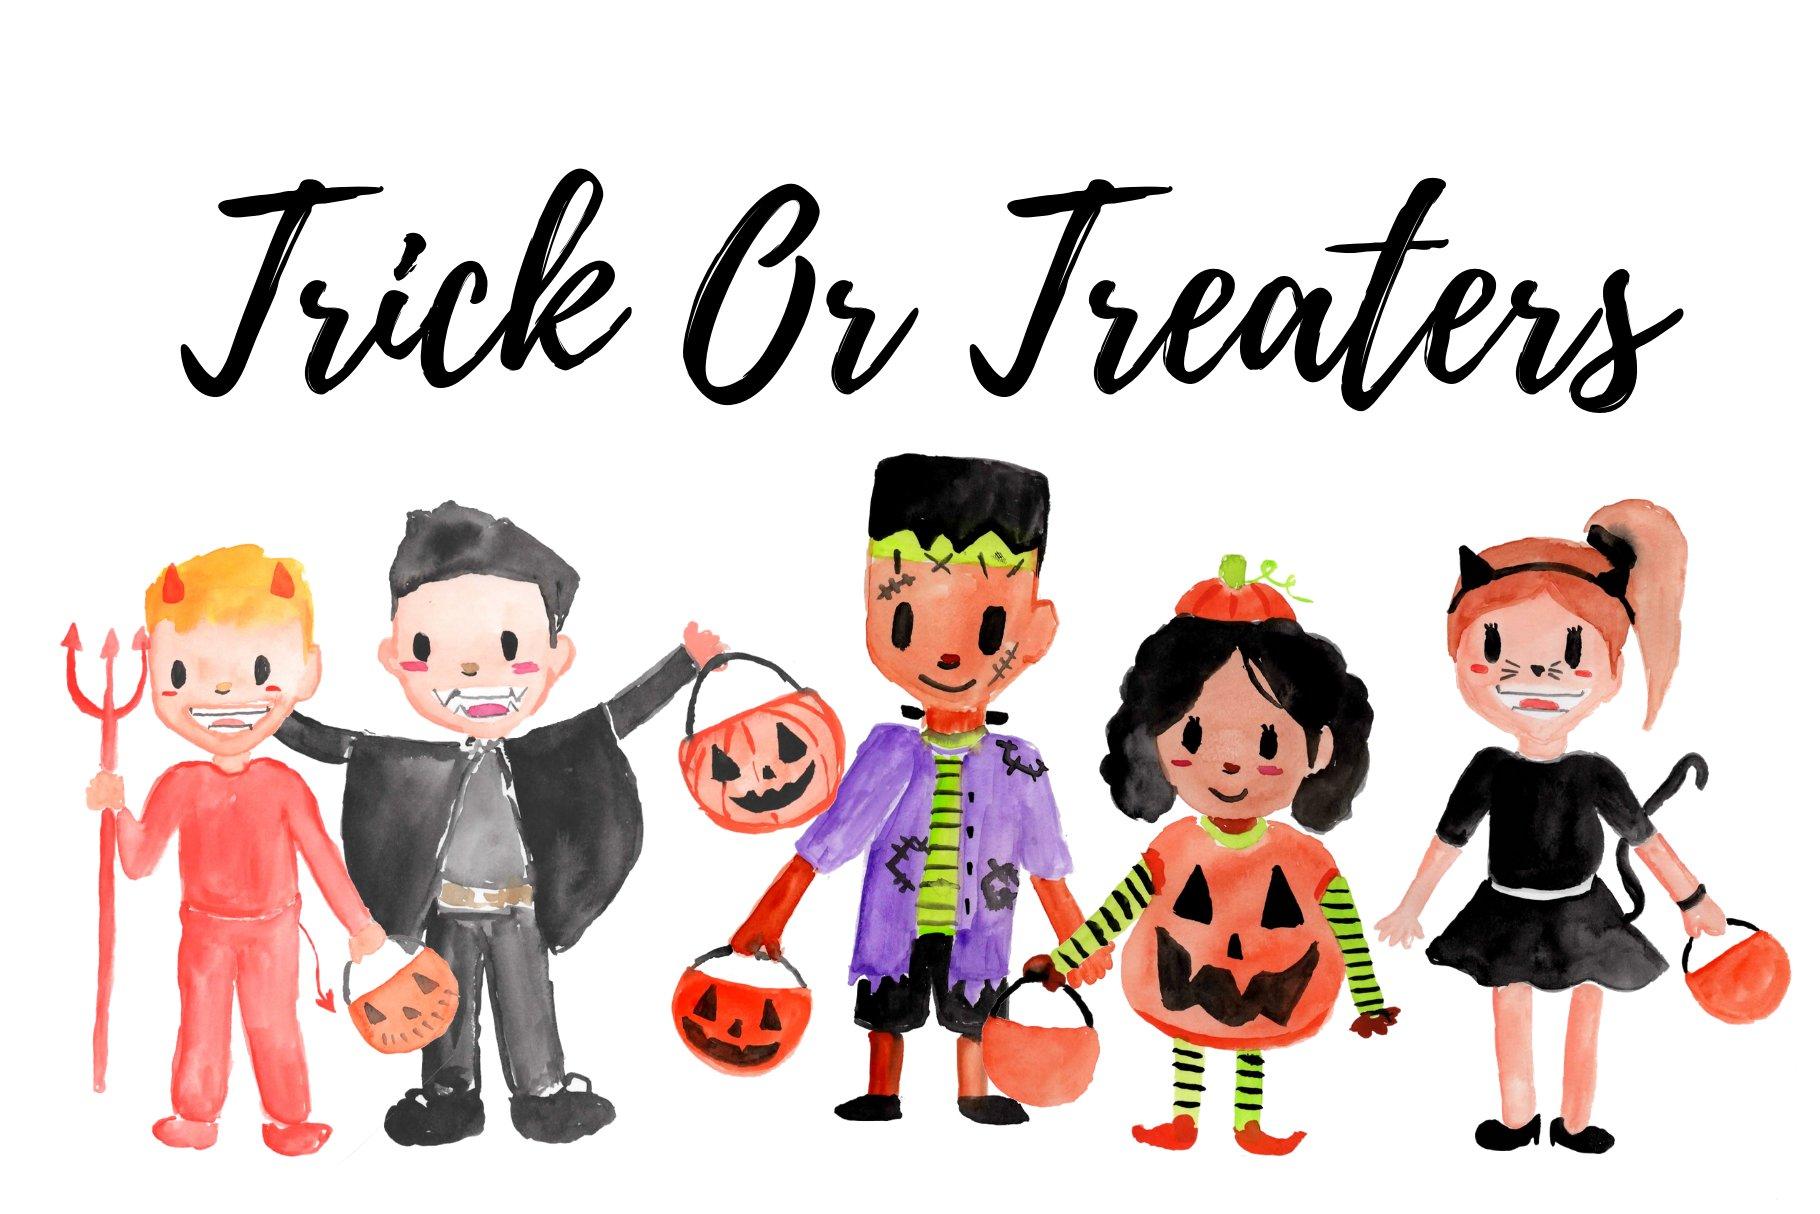 Halloween trick or treaters clip art - Halloween trick or treaters clipart  photo - NiceClipart.com